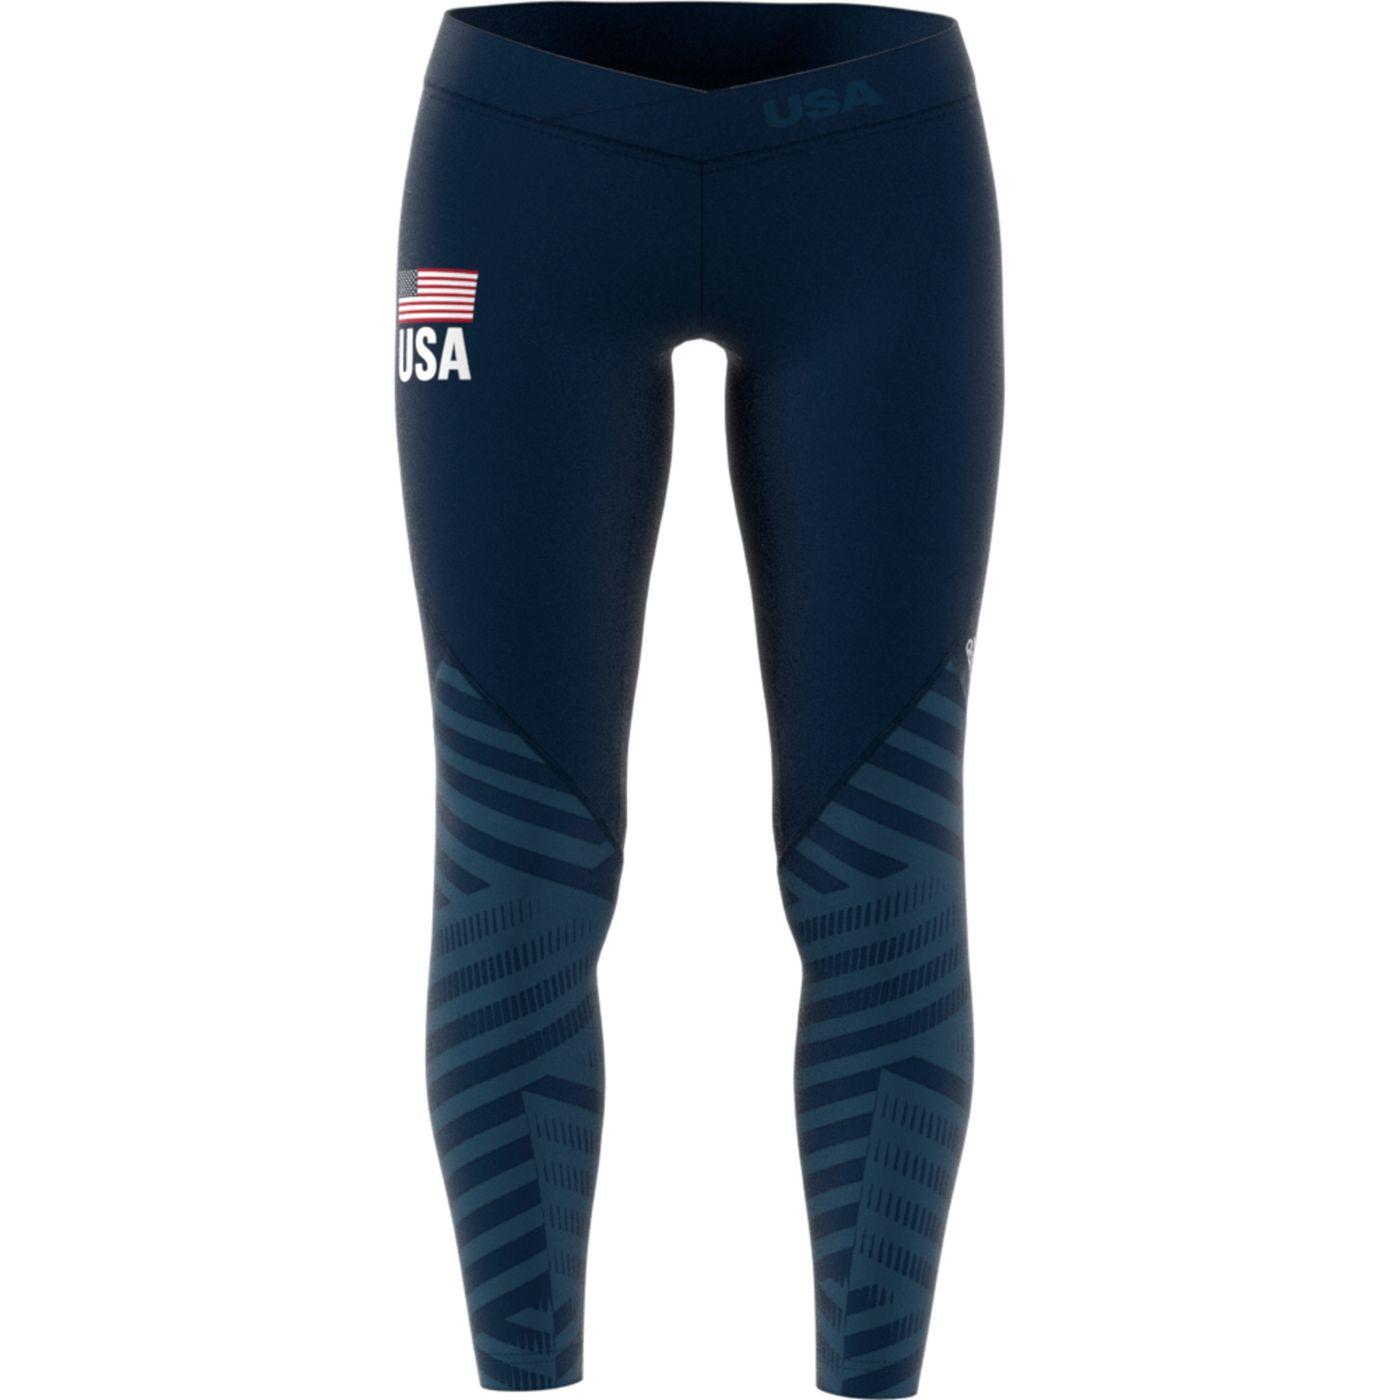 Adidas Women's Alphaskin USA Volleyball Long Tights